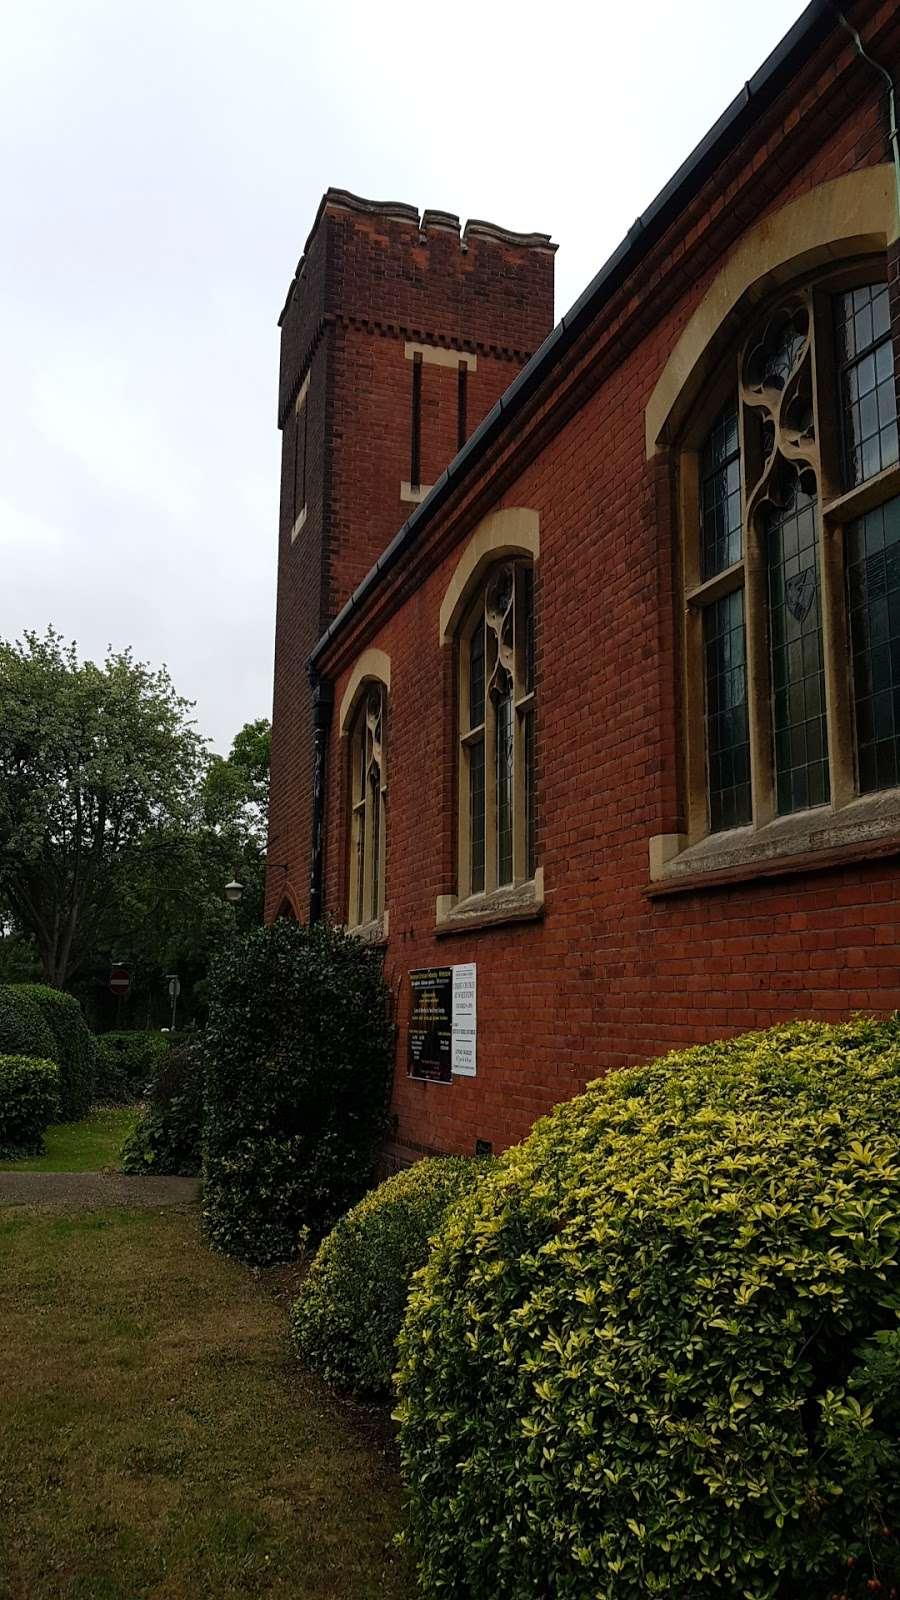 Christ Church - church  | Photo 5 of 9 | Address: Oakleigh Park N, Whetstone, London N20 9AR, UK | Phone: 020 3234 4059